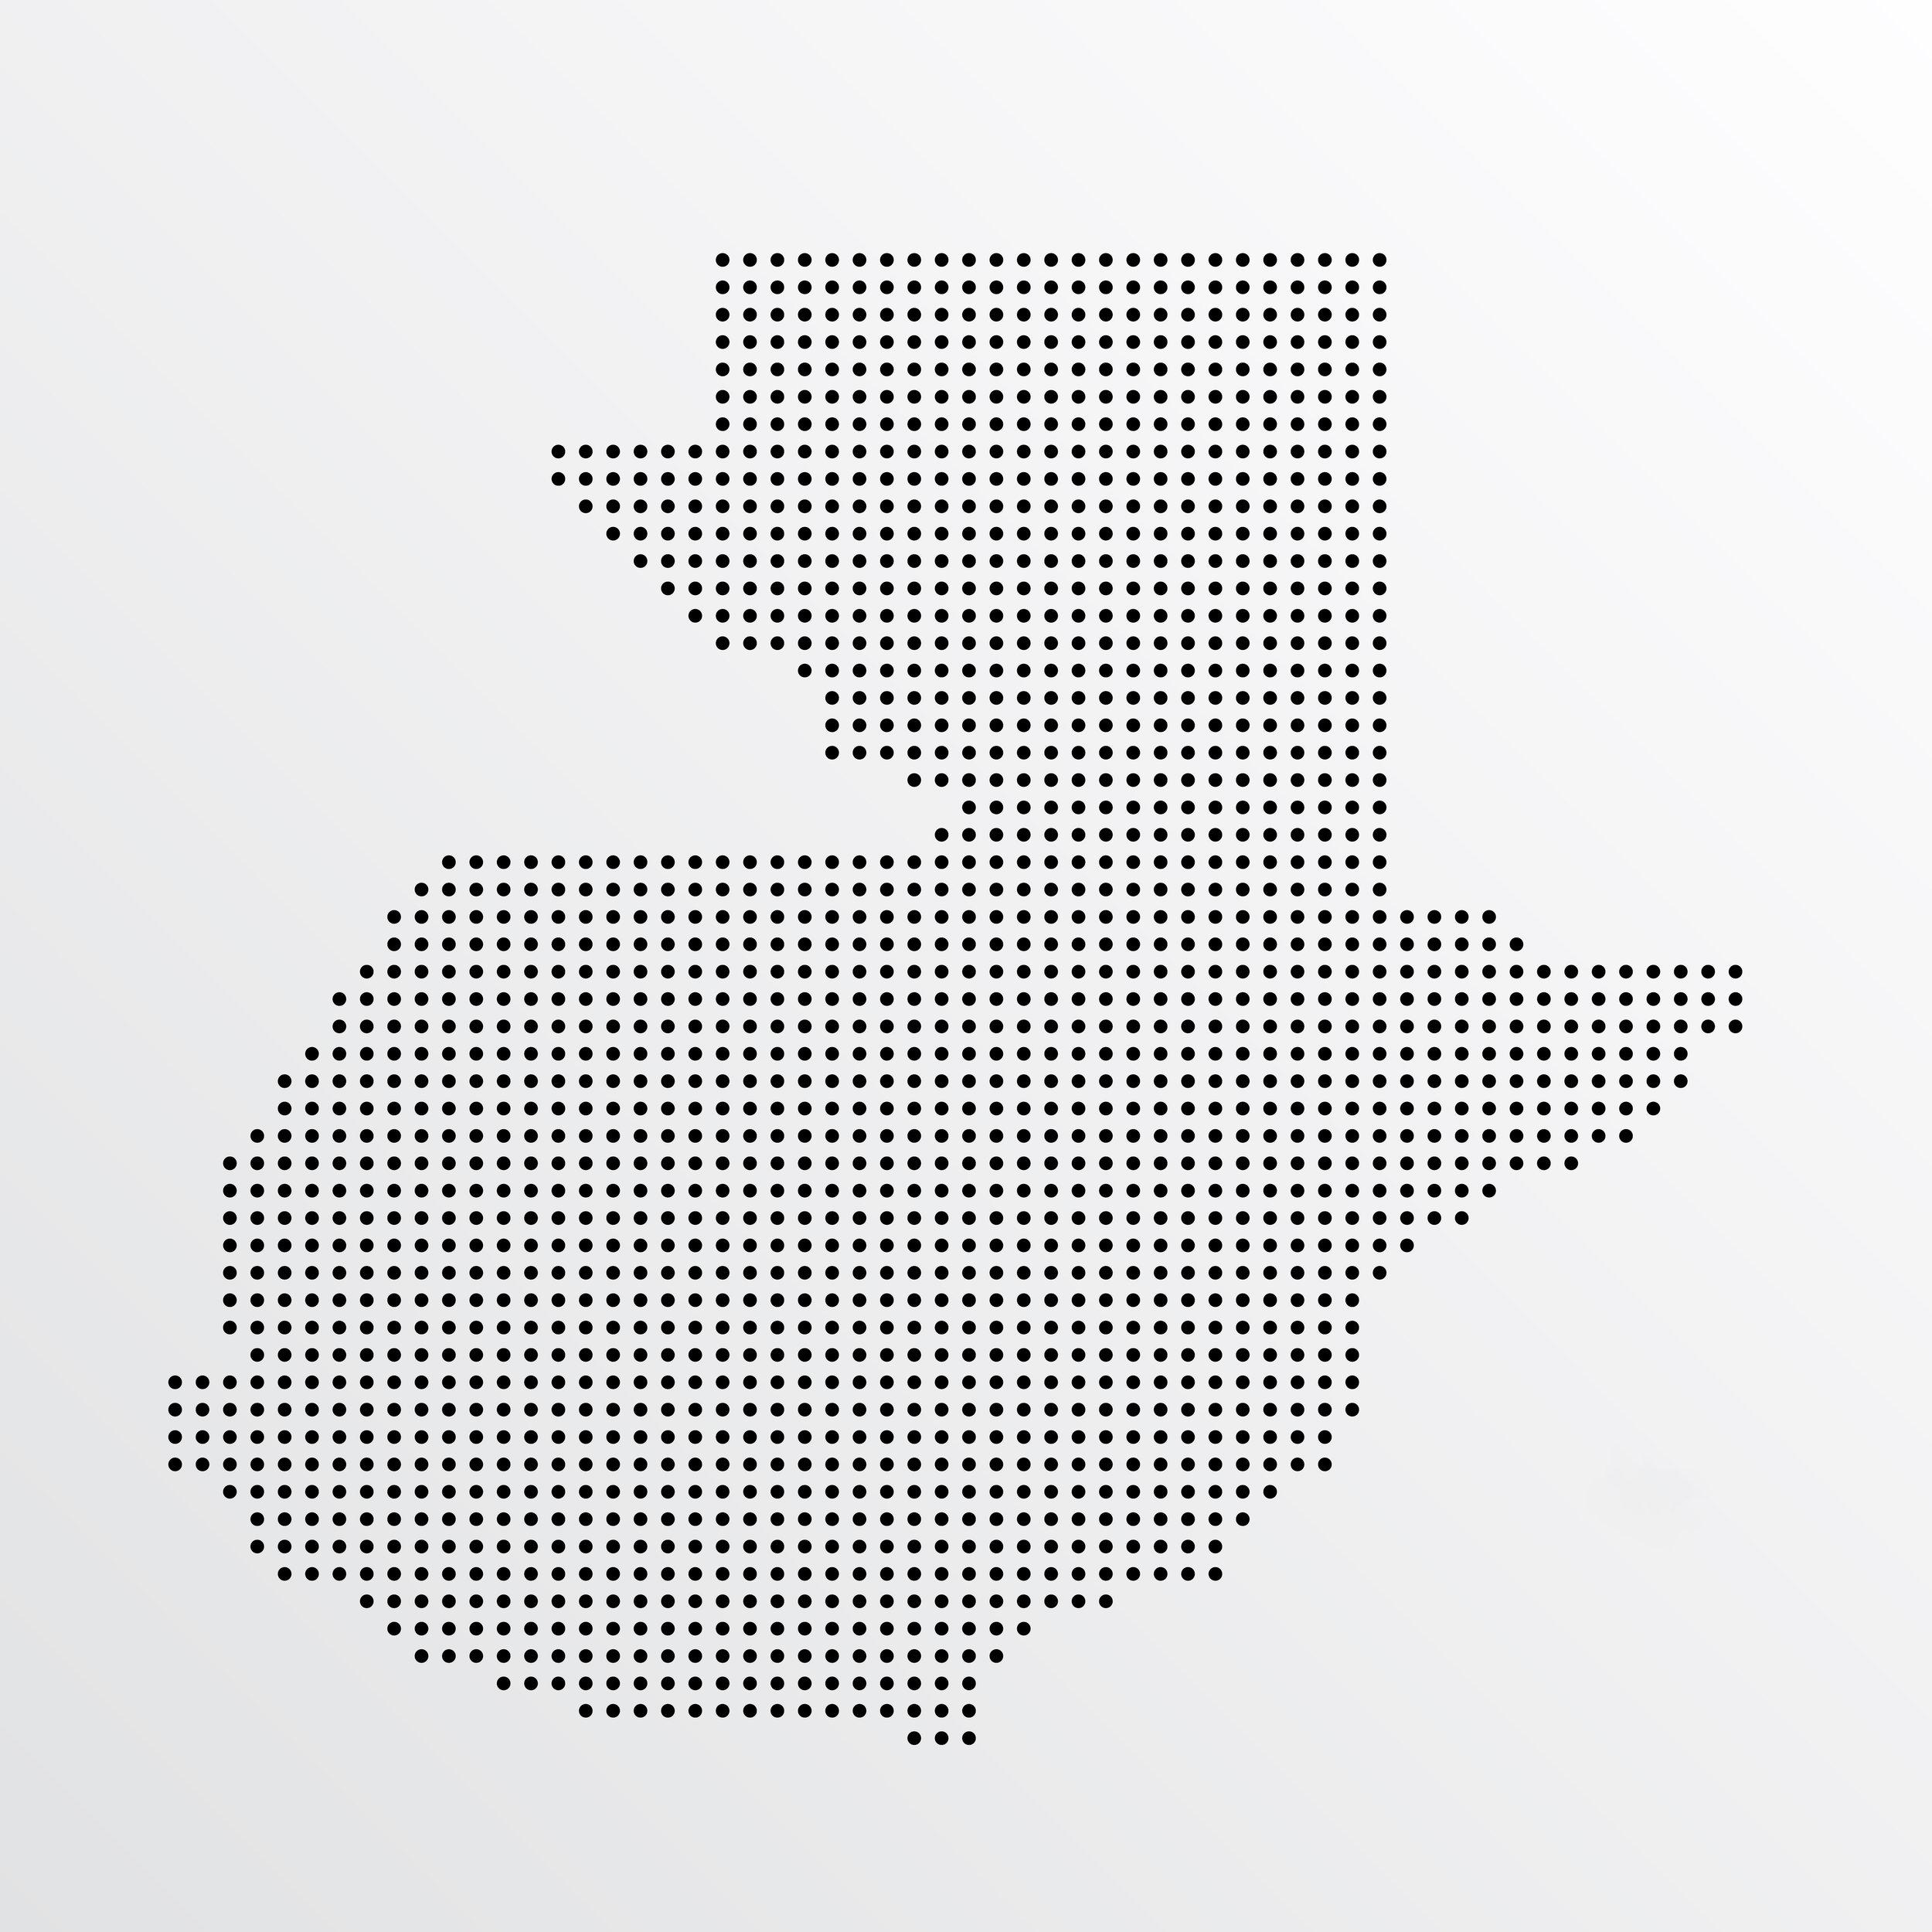 guate map.jpg